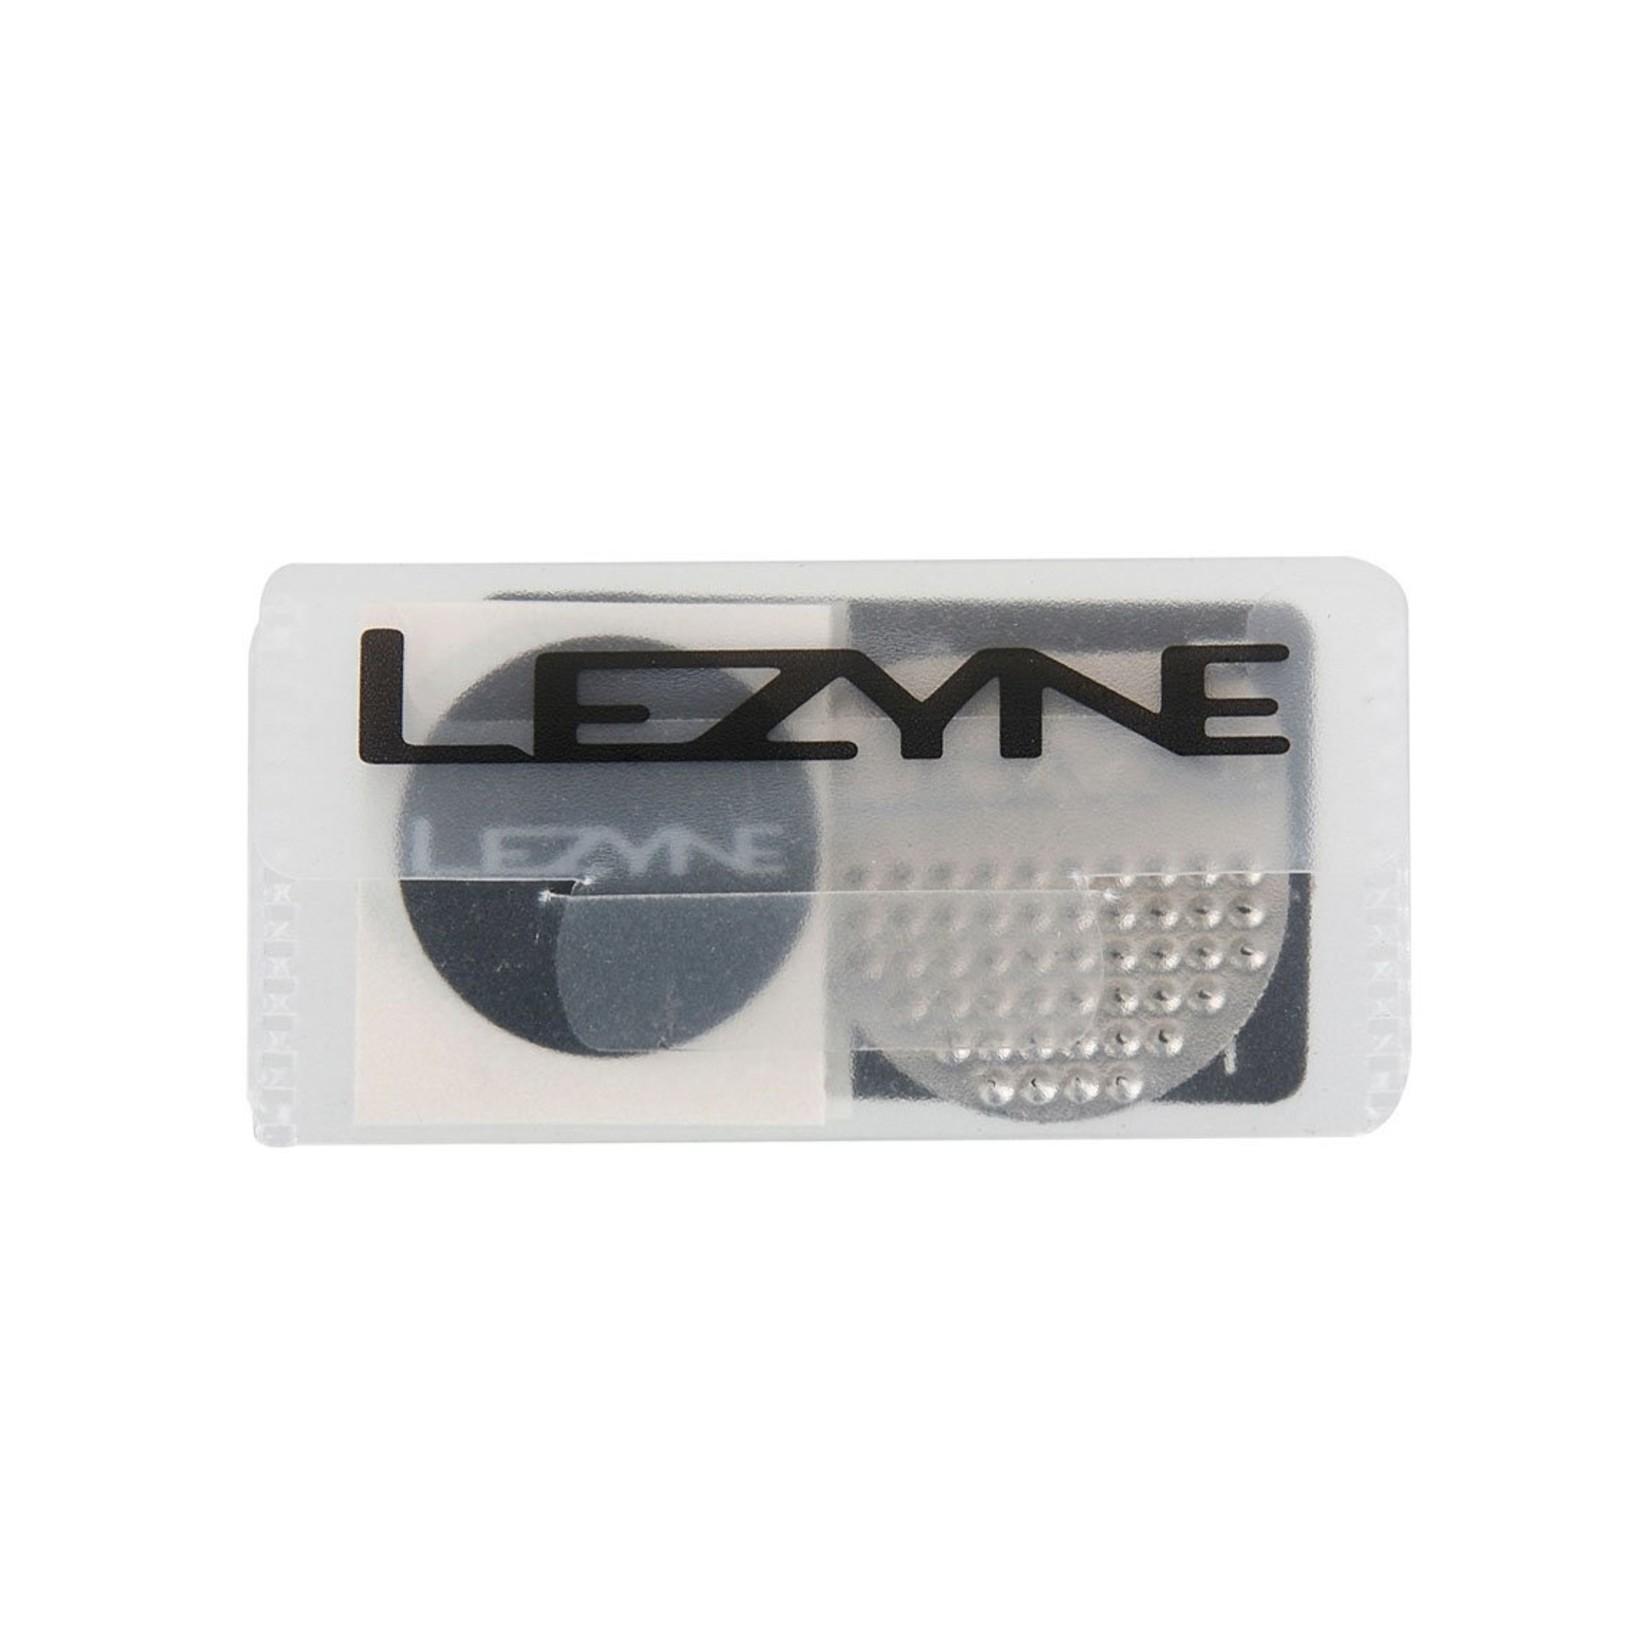 Lezyne Lezyne, Glueless Six-Patch Smart Kit